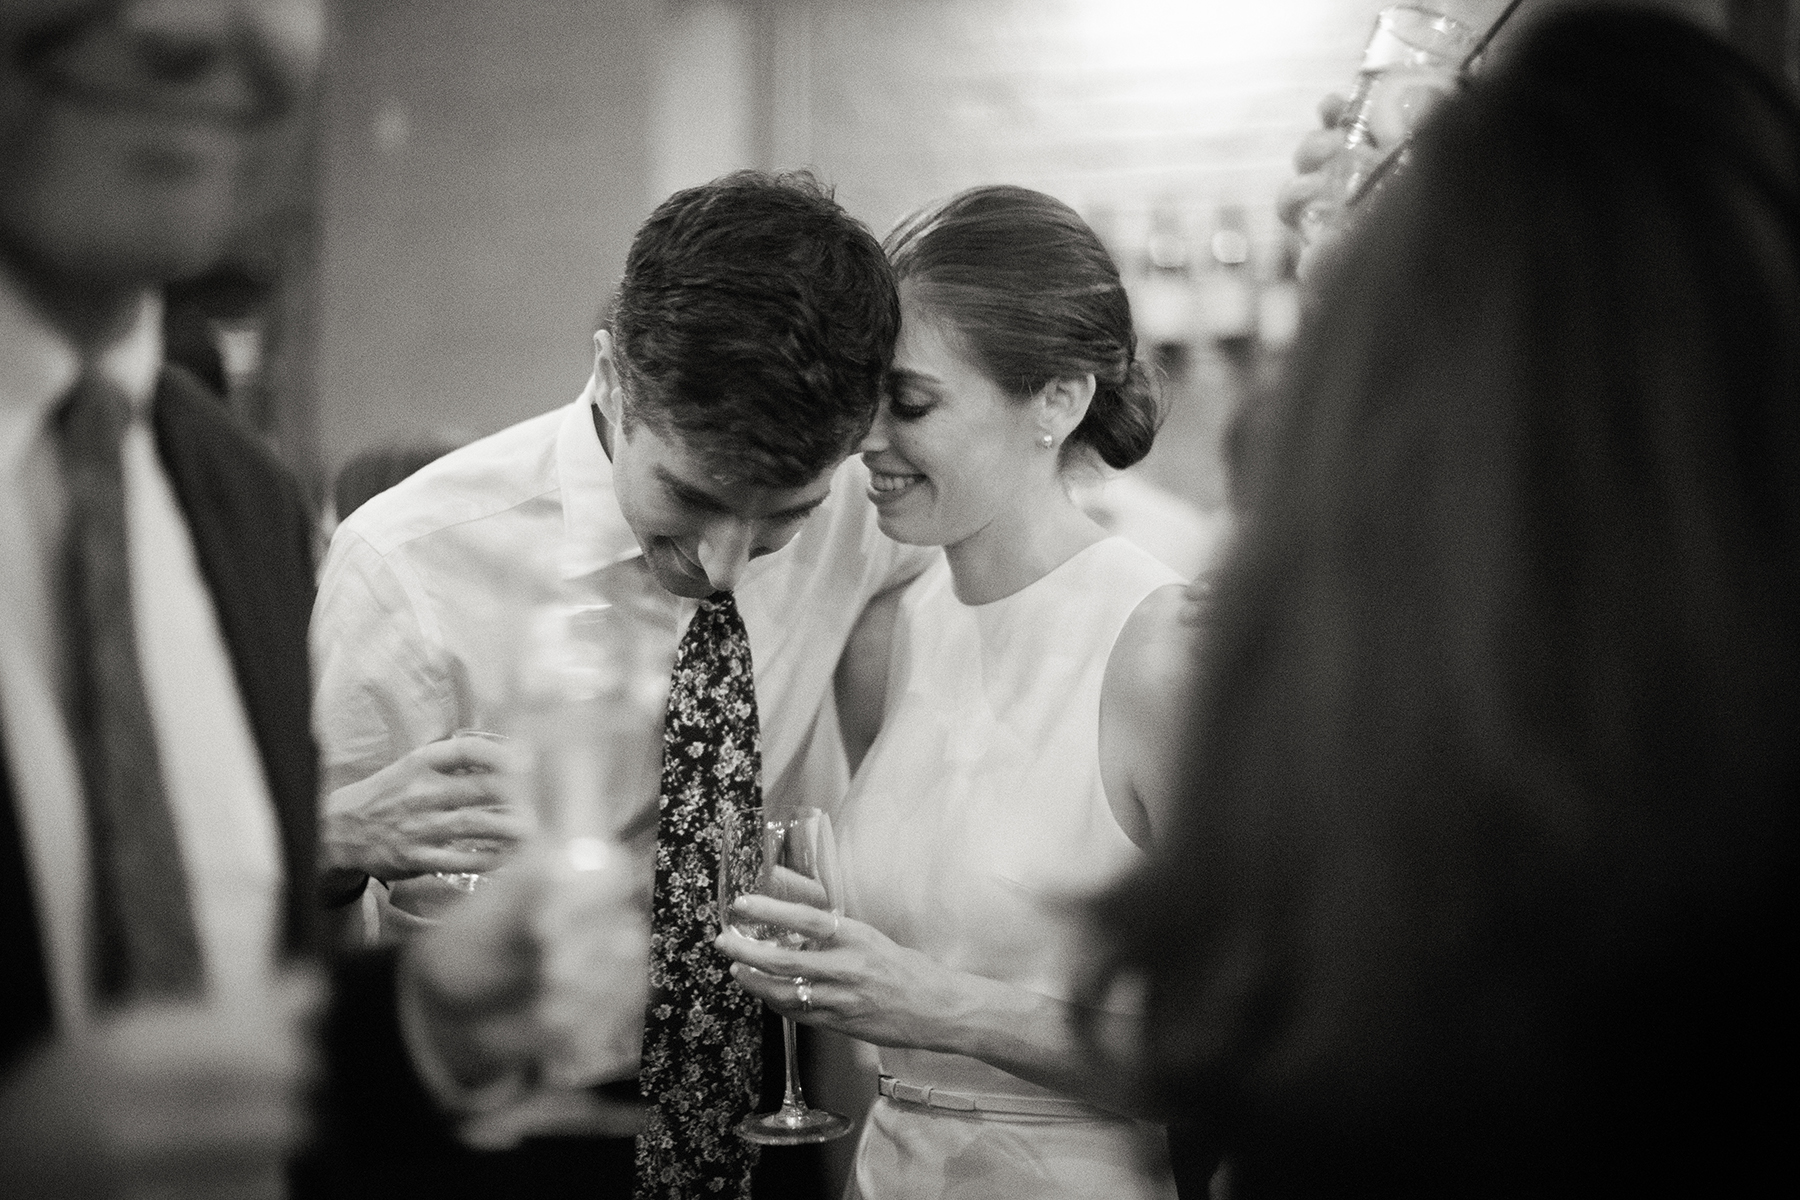 raquelreis_wedding_photography_brooklynwinery_051.jpg